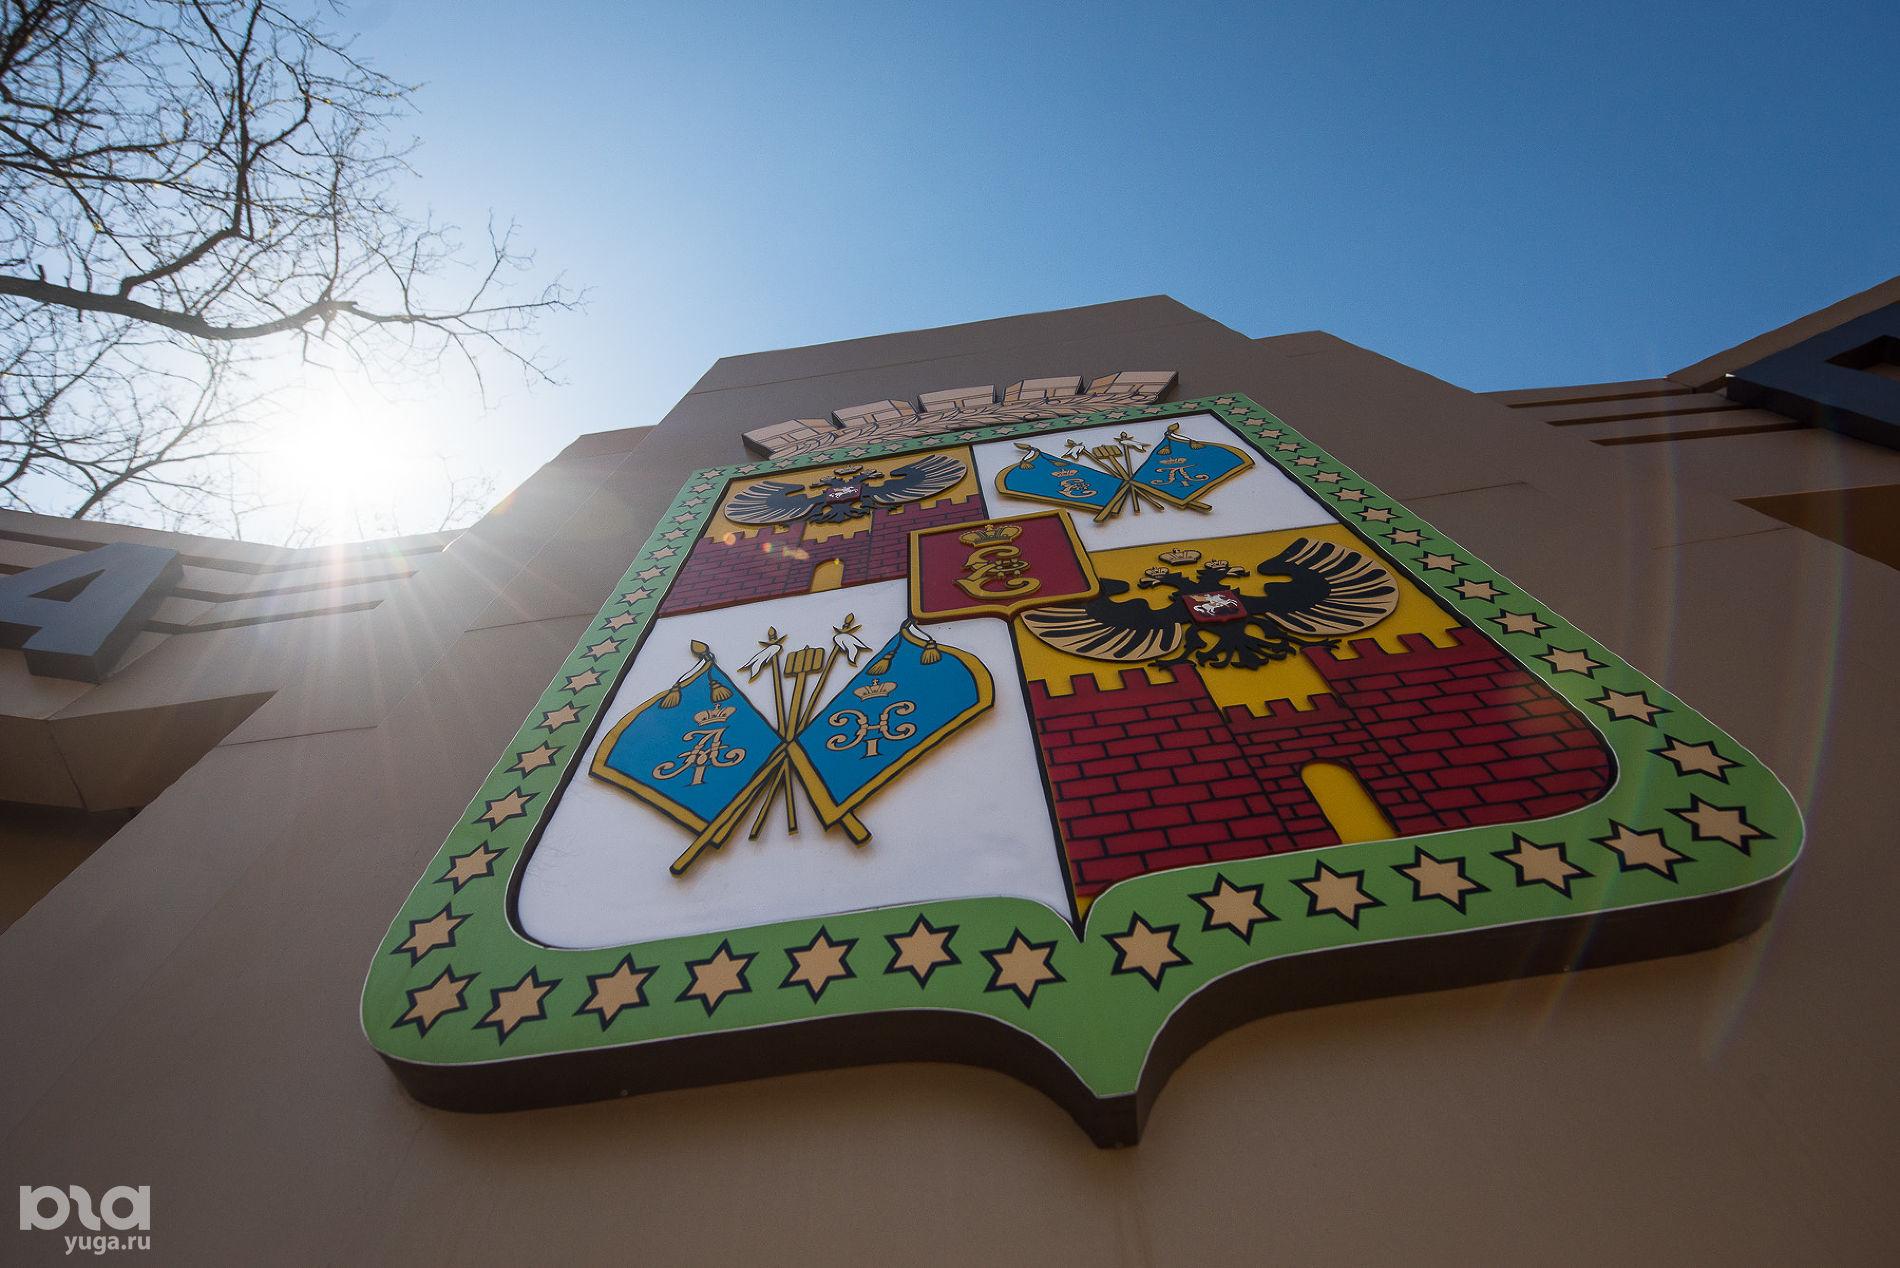 Герб Краснодара  ©Фото Елены Синеок, Юга.ру